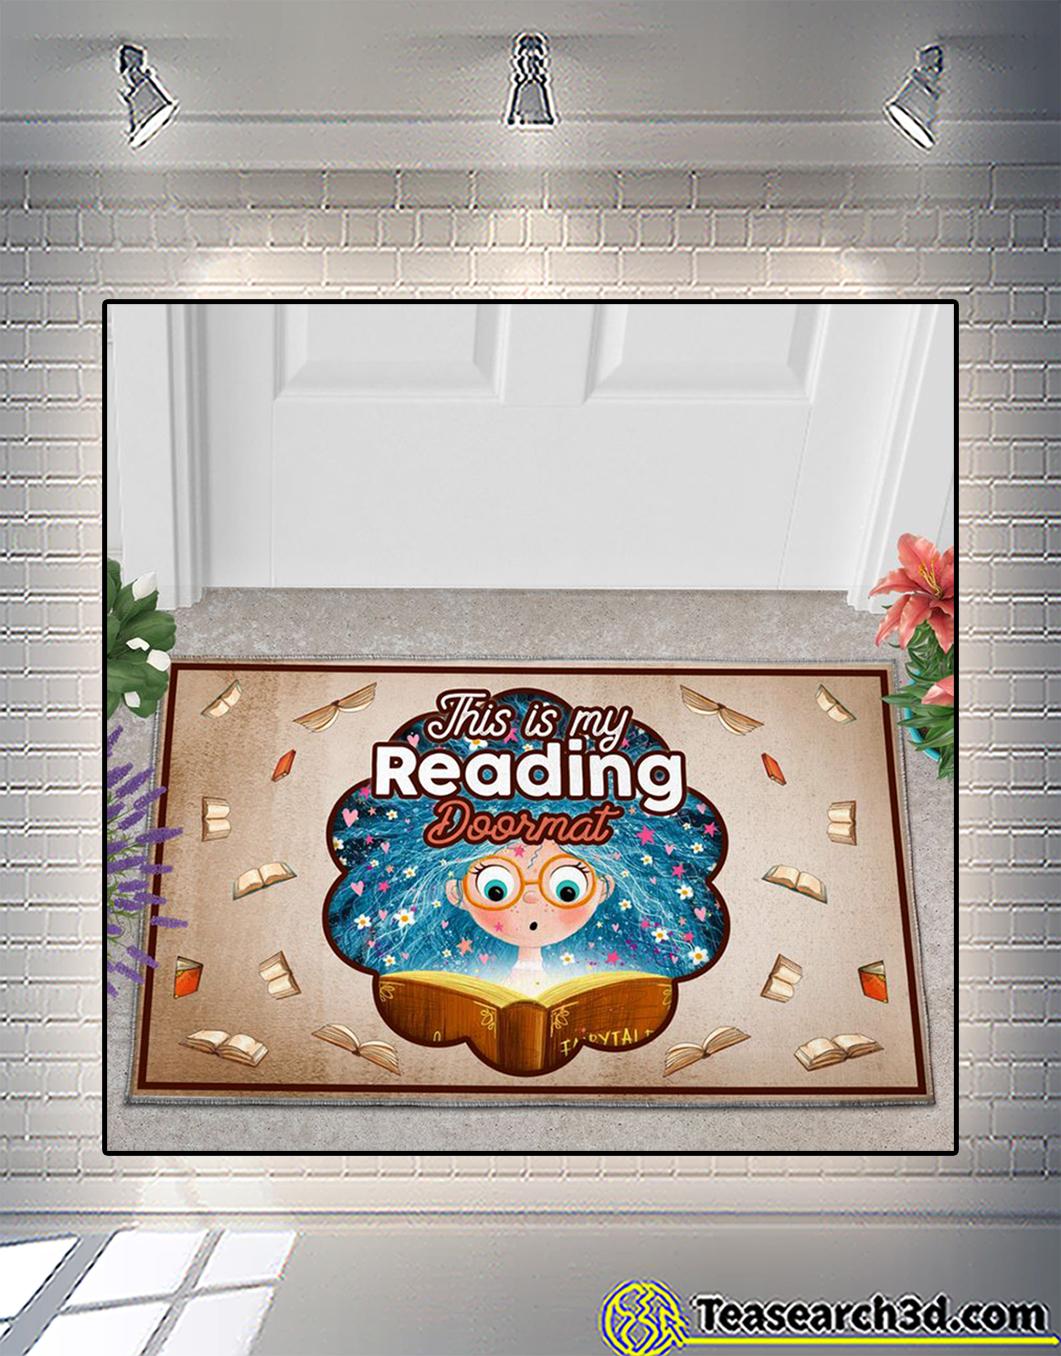 This is my reading doormat 1